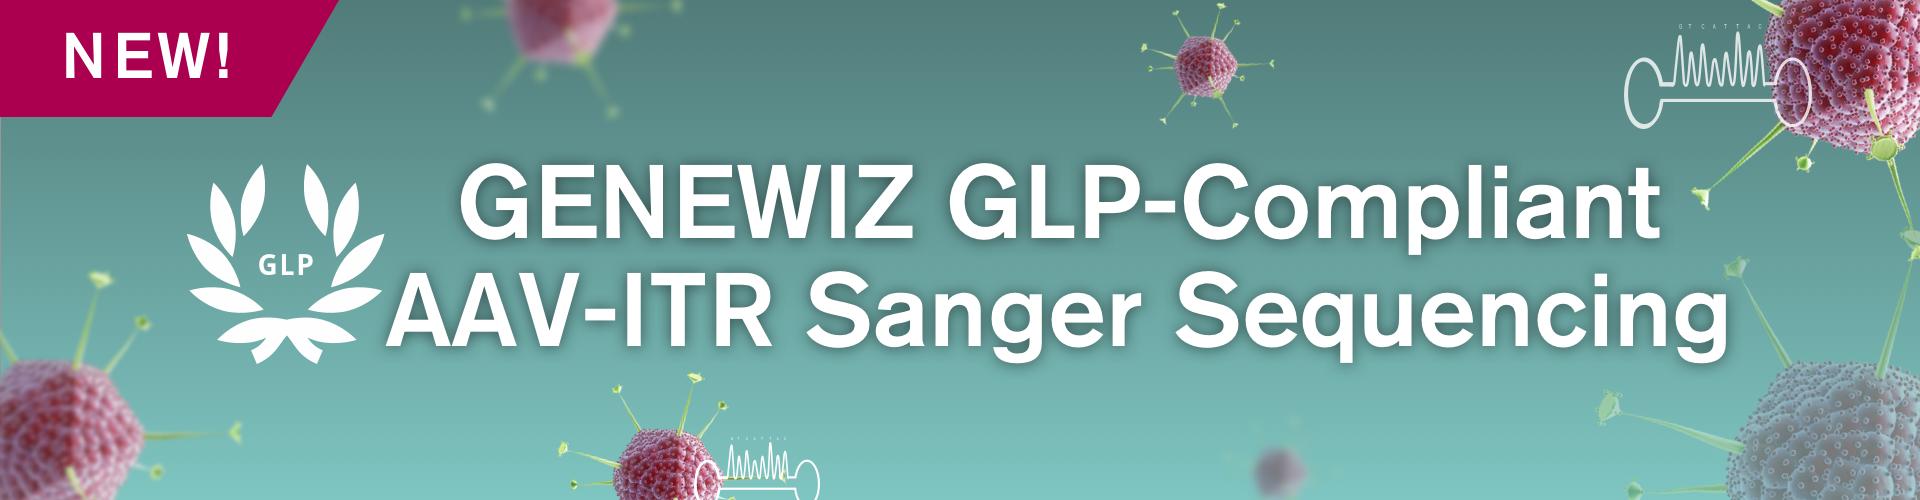 GLP_AAV-ITR-Seq_LP-Hero-Med